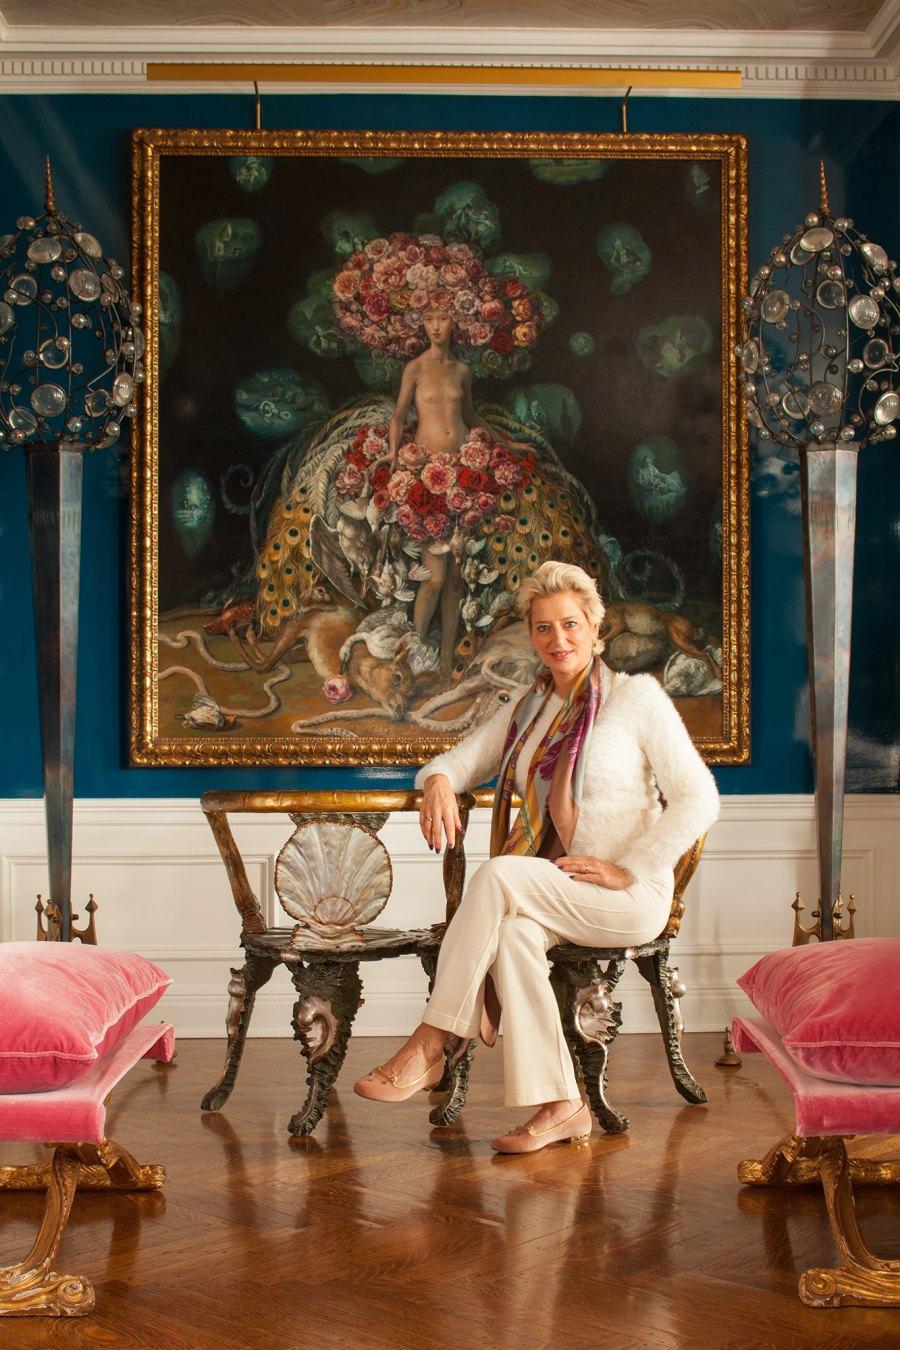 Living Room Dorinda Medley Mick Hales Real Housewives of New York's Dorinda Medley Is Renting Out Her 18-Acres Blue Stone Manor